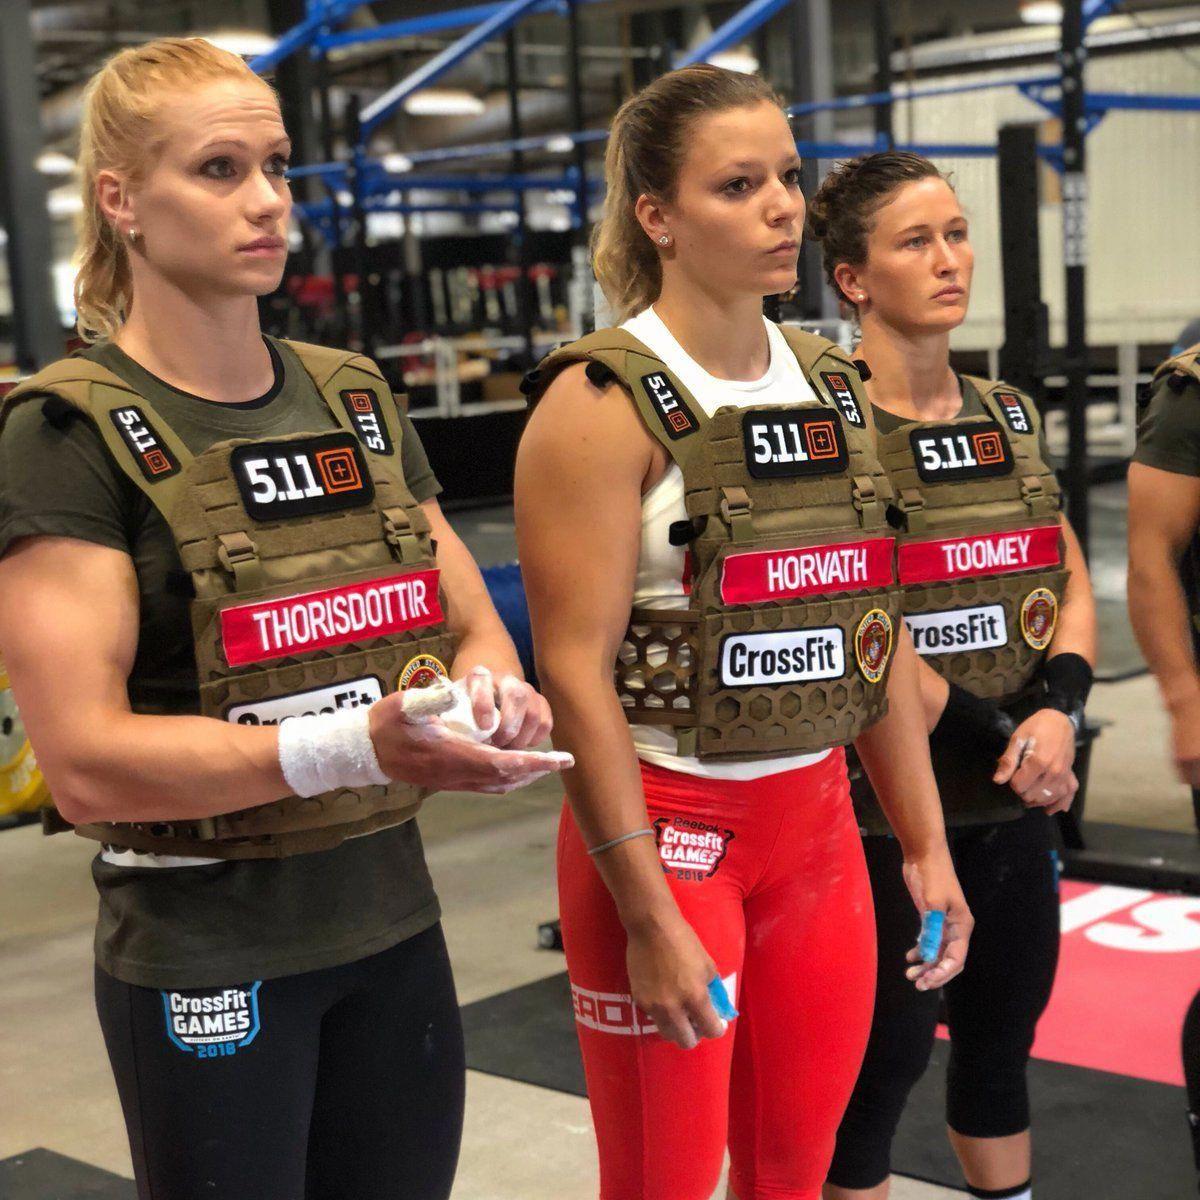 Fitness Zone Gym LuxuryFitnessVacations Crossfit in 2020